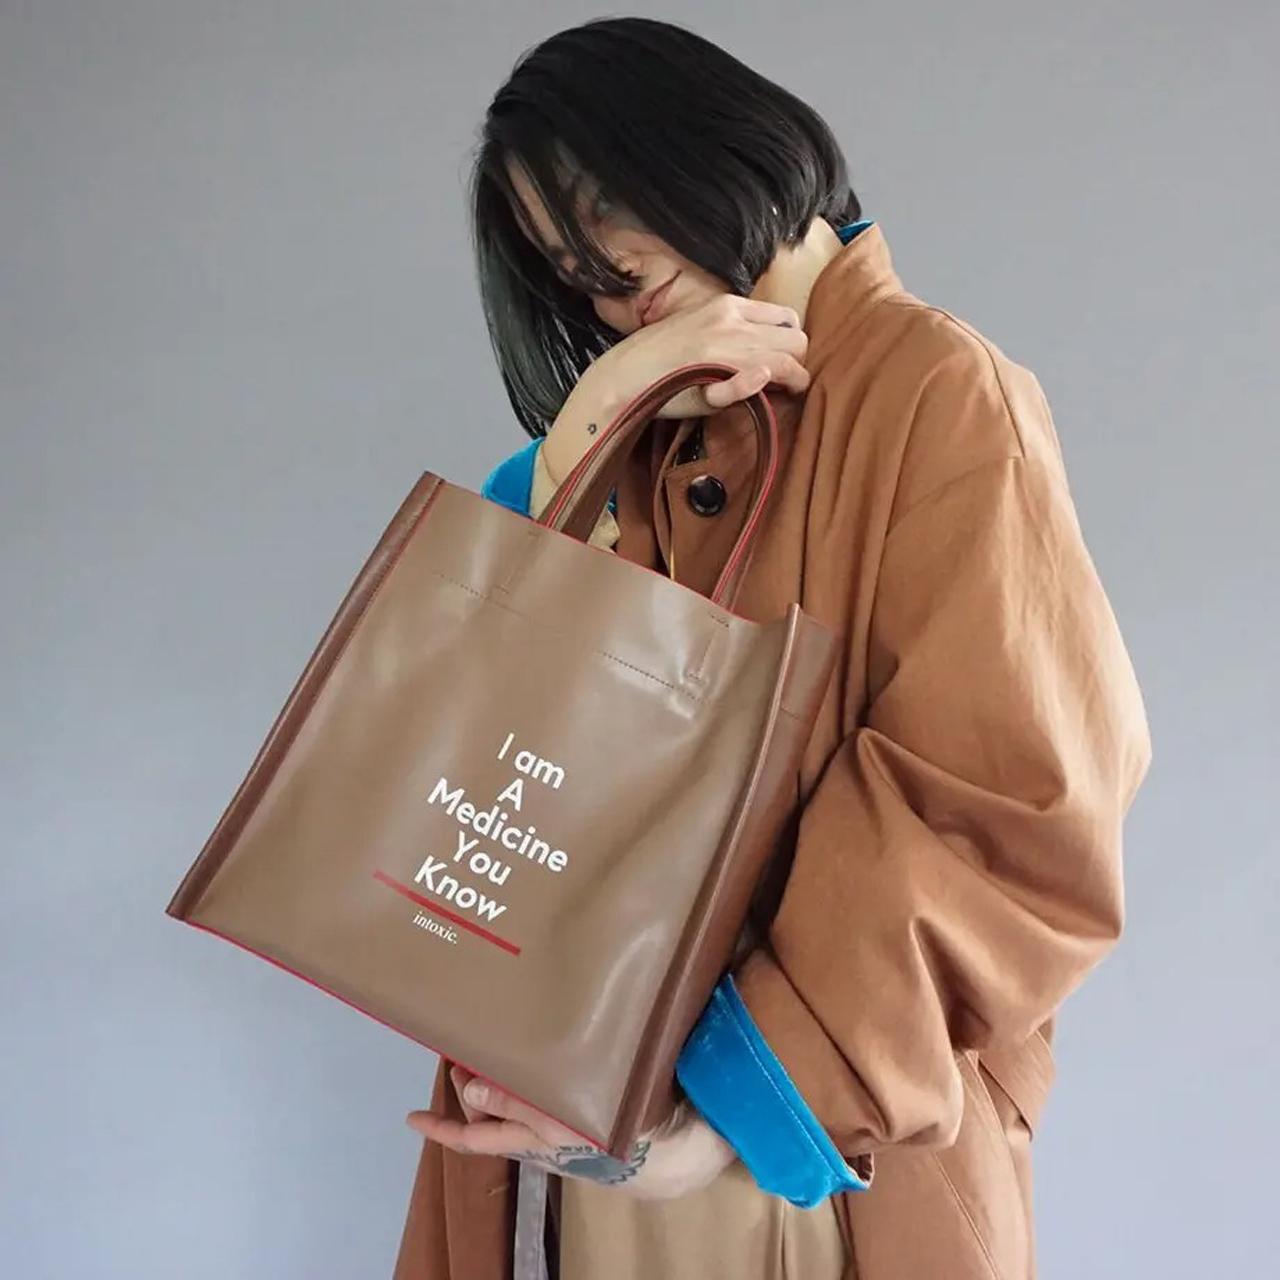 intoxic/イントキシック【予約:9月中旬お届け予定】Autumn intoxic.新作 BOX TOTE FC-008